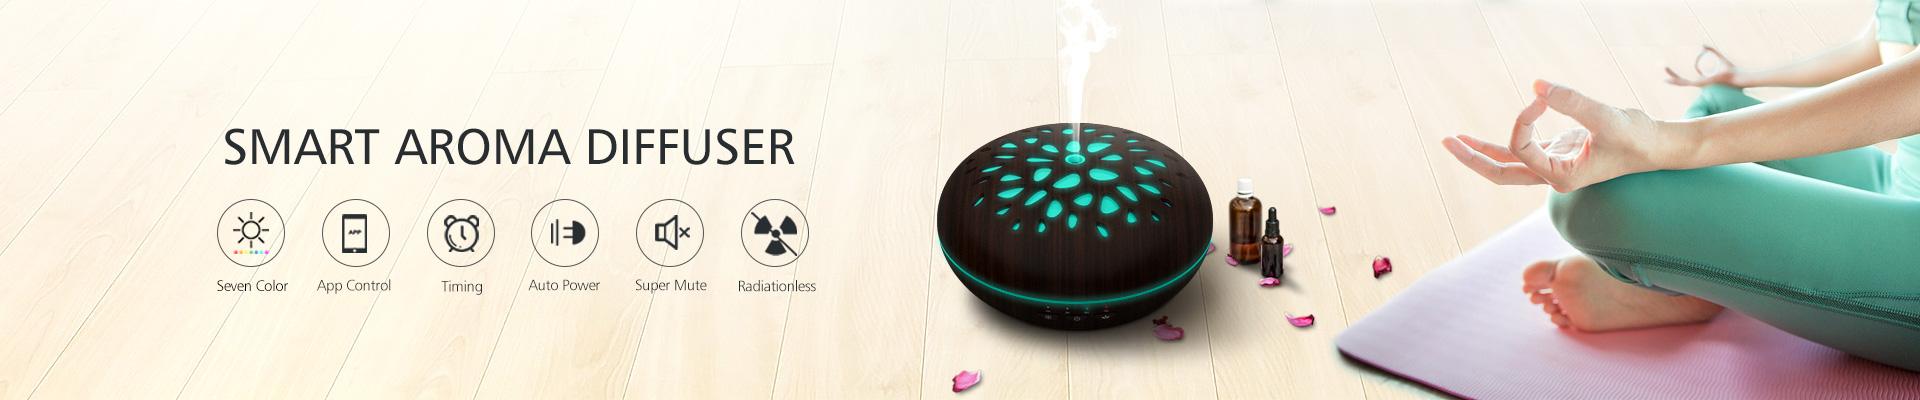 Smart ultrasonic aroma diffuser